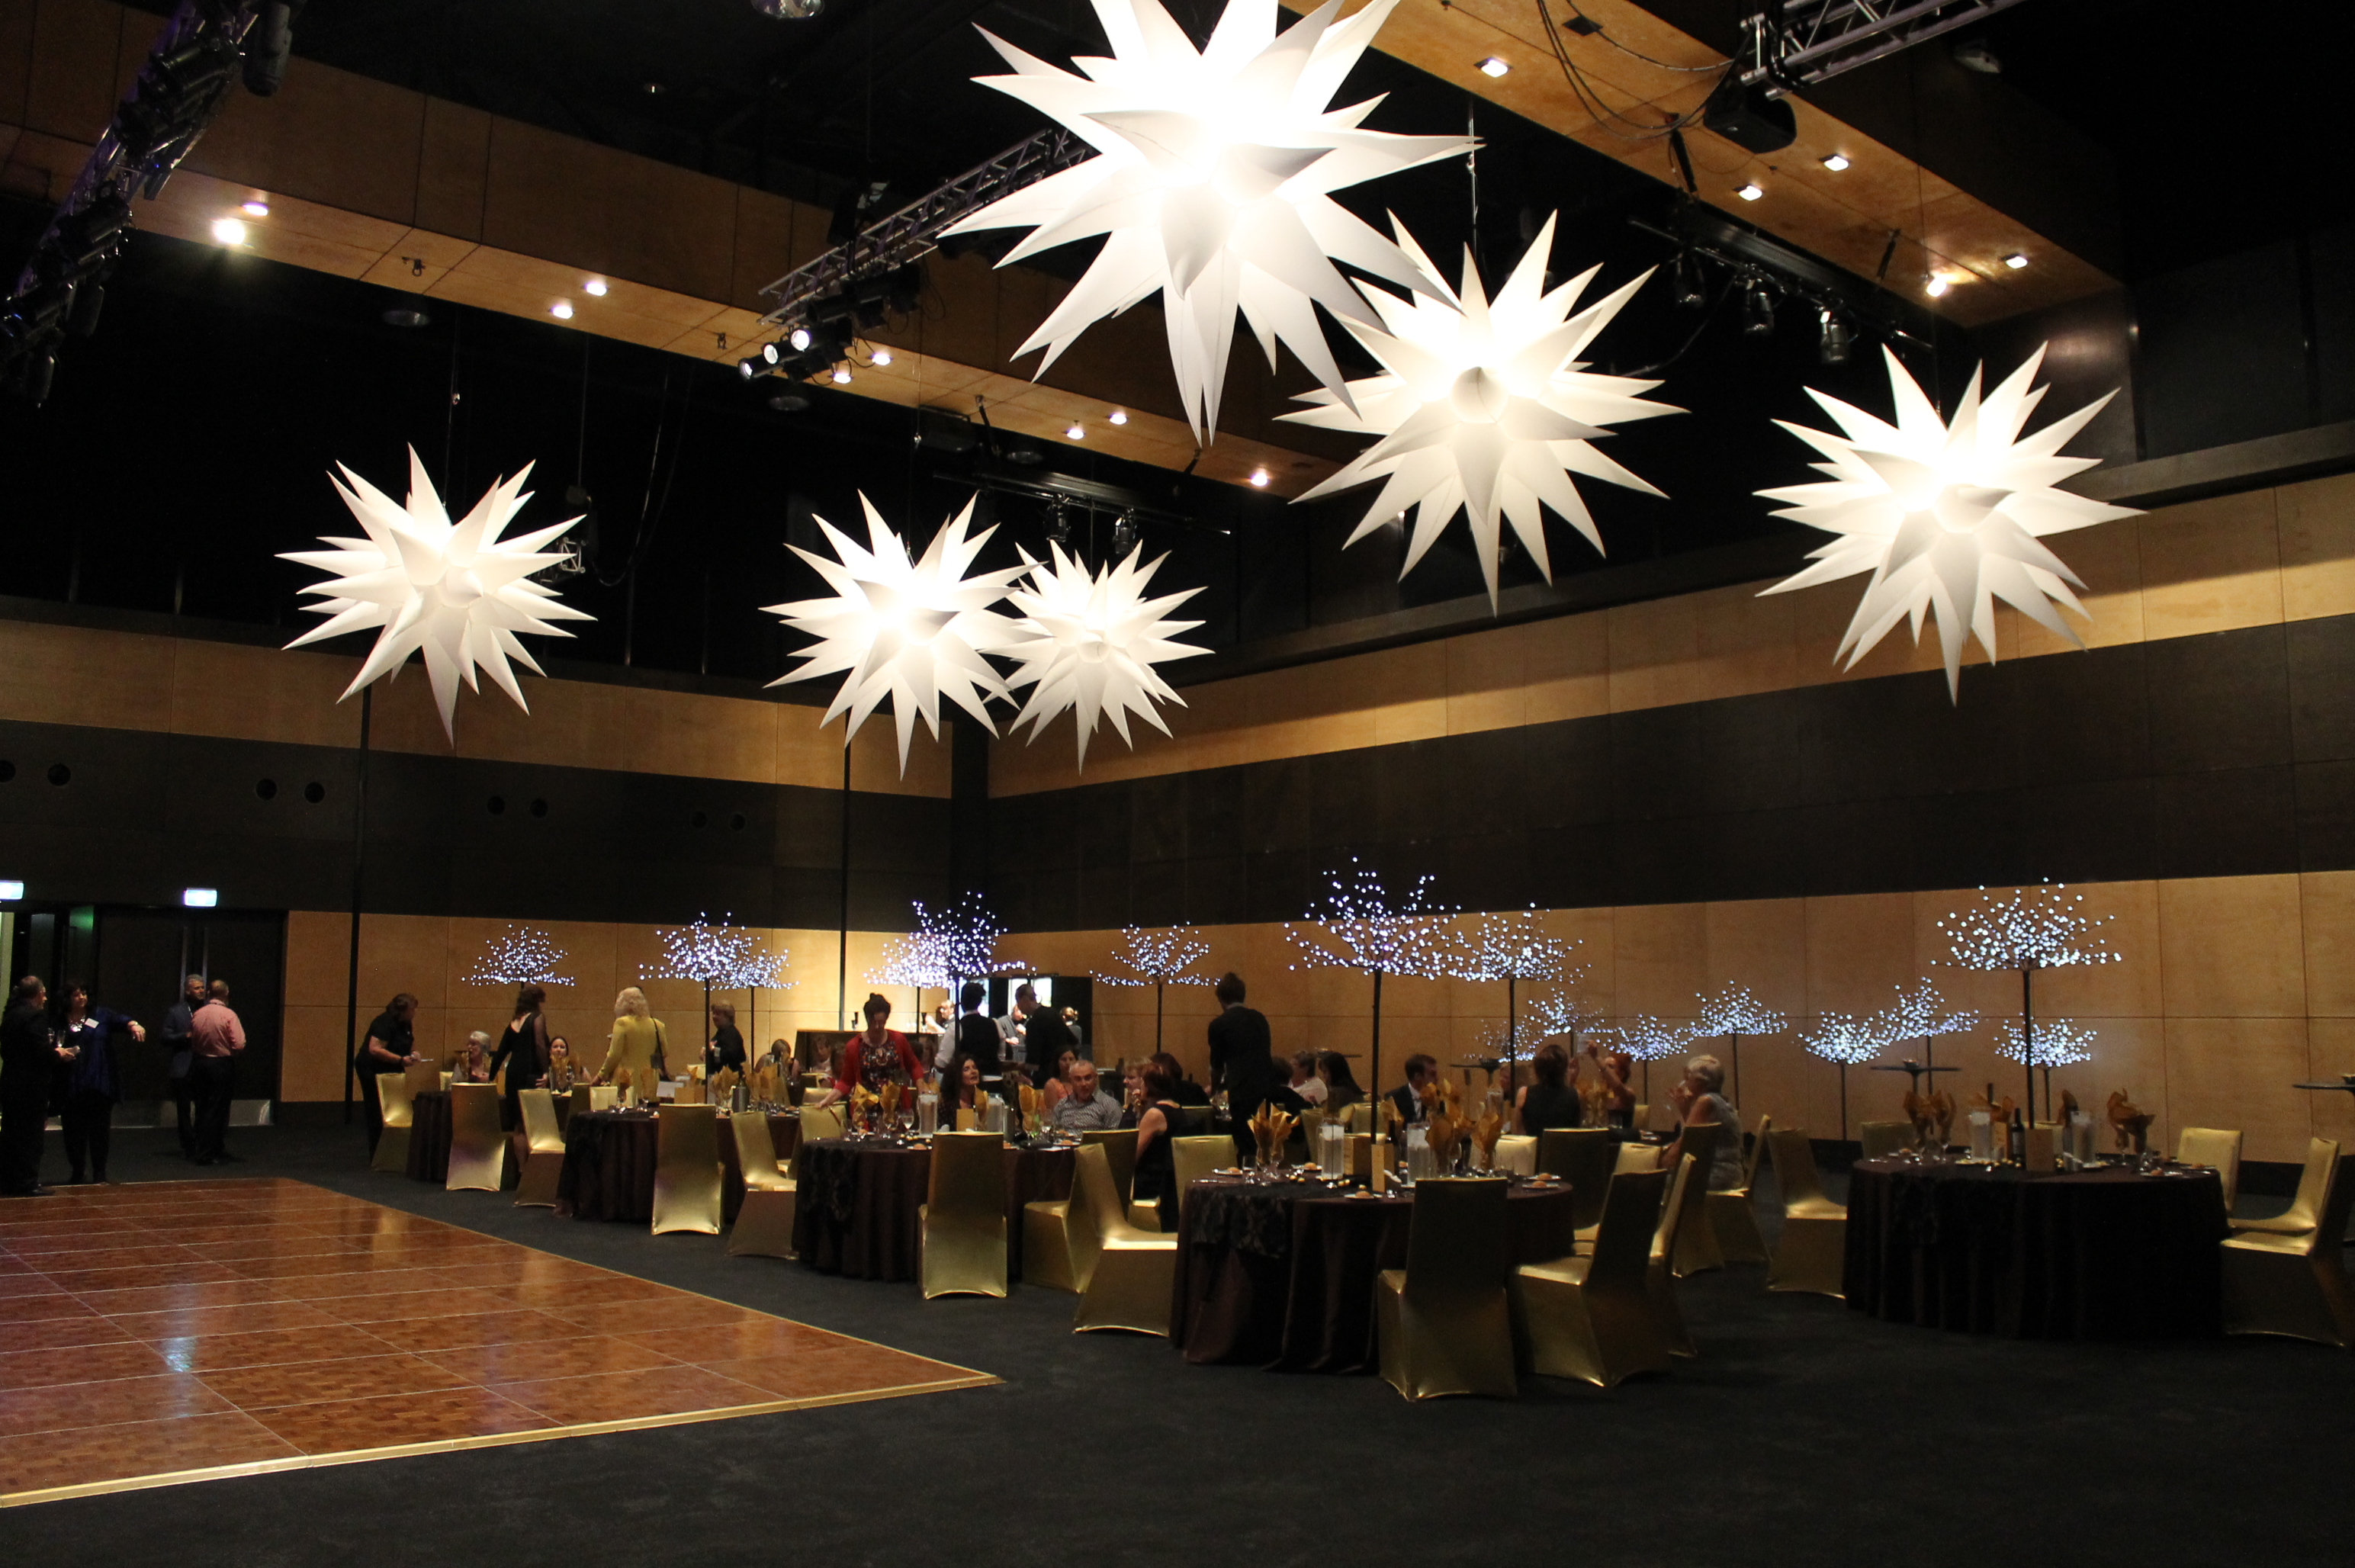 white-inflatable-stars